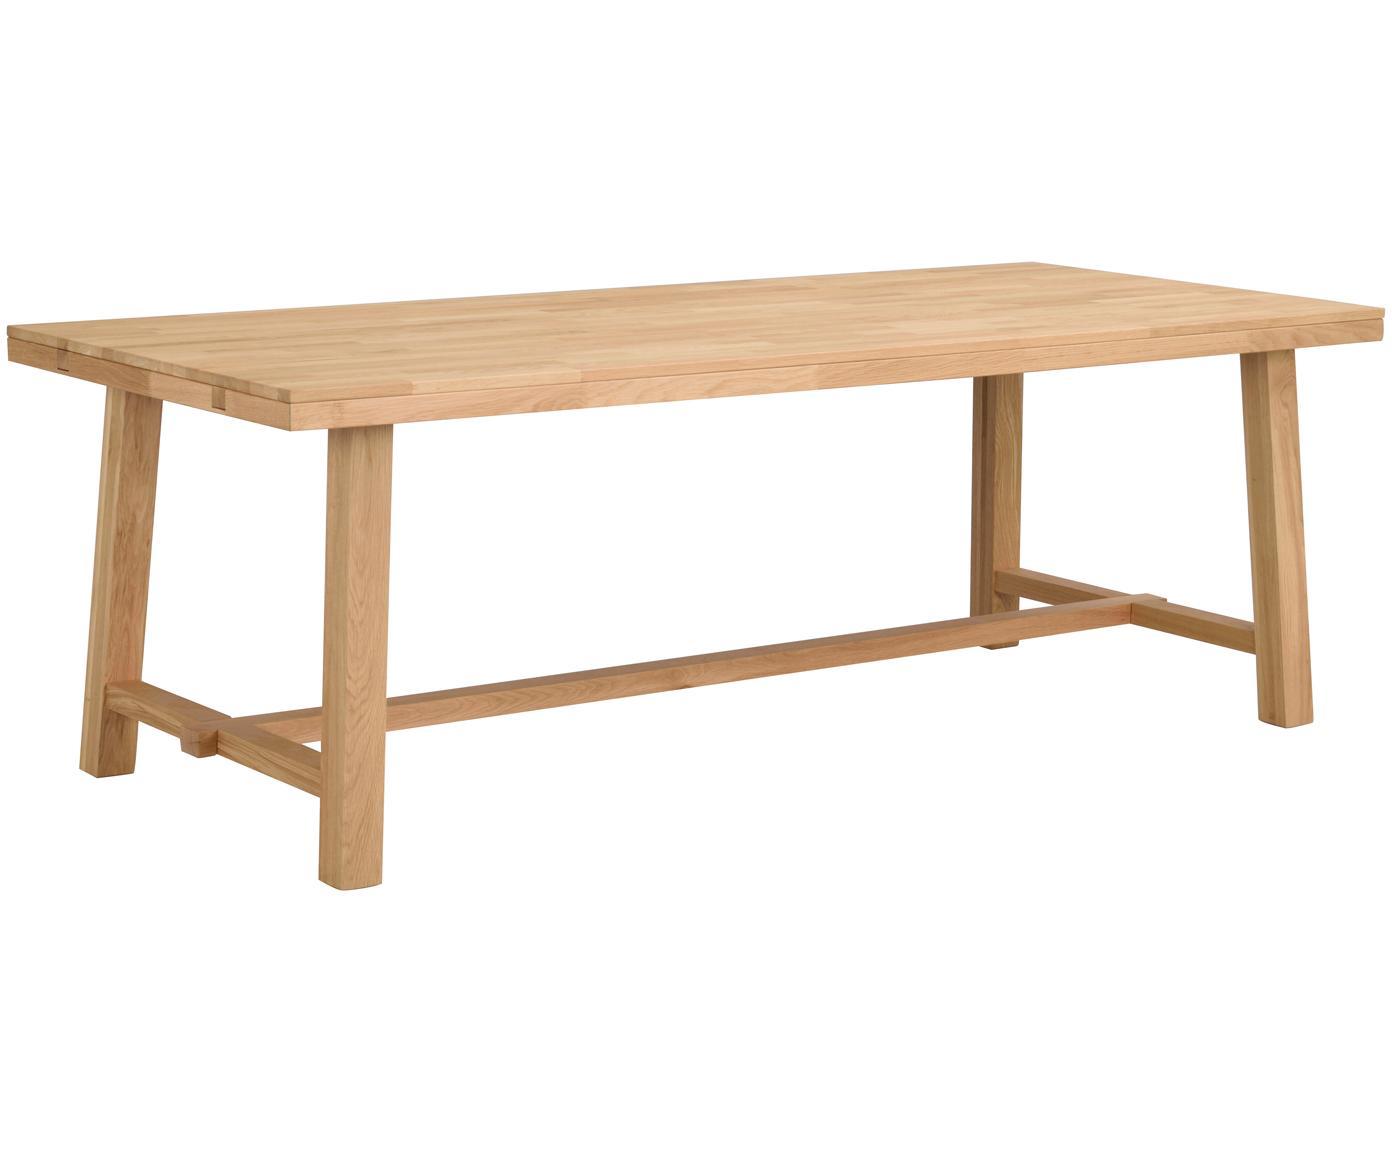 Mesa de comedor extensible de madera maciza Brooklyn, Madera de roble maciza, lacado transparente, Roble, An 220-270 x F 95 cm